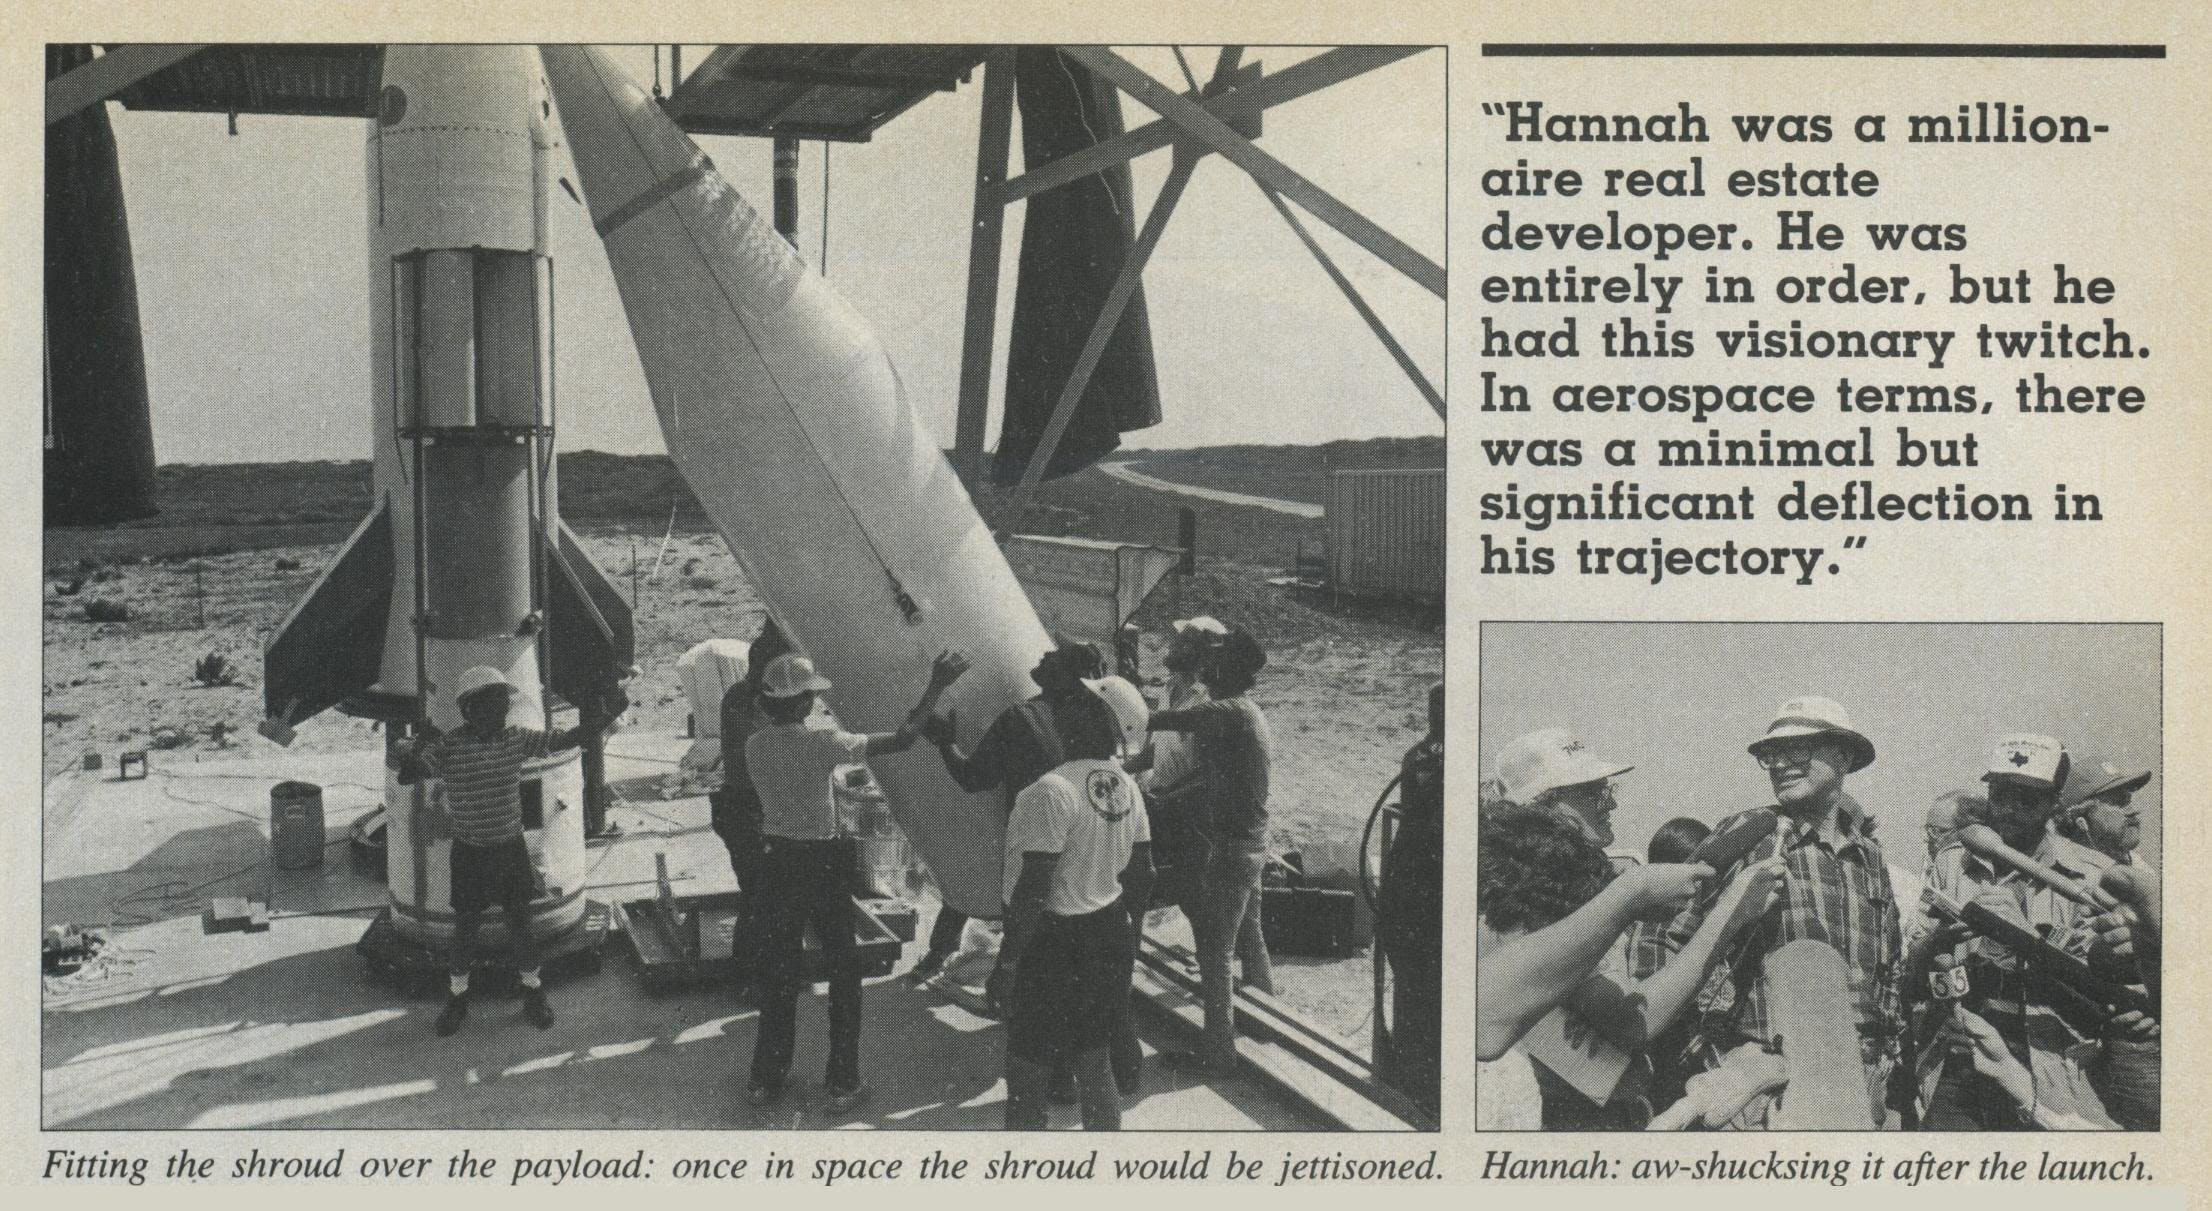 Mr Hannahs Rocket - 0009